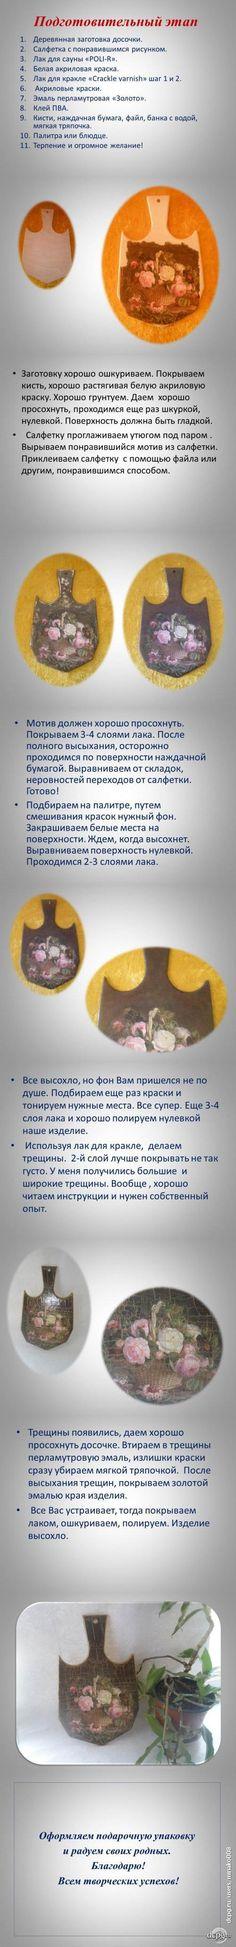 http://dcpg.ru/mclasses/900/